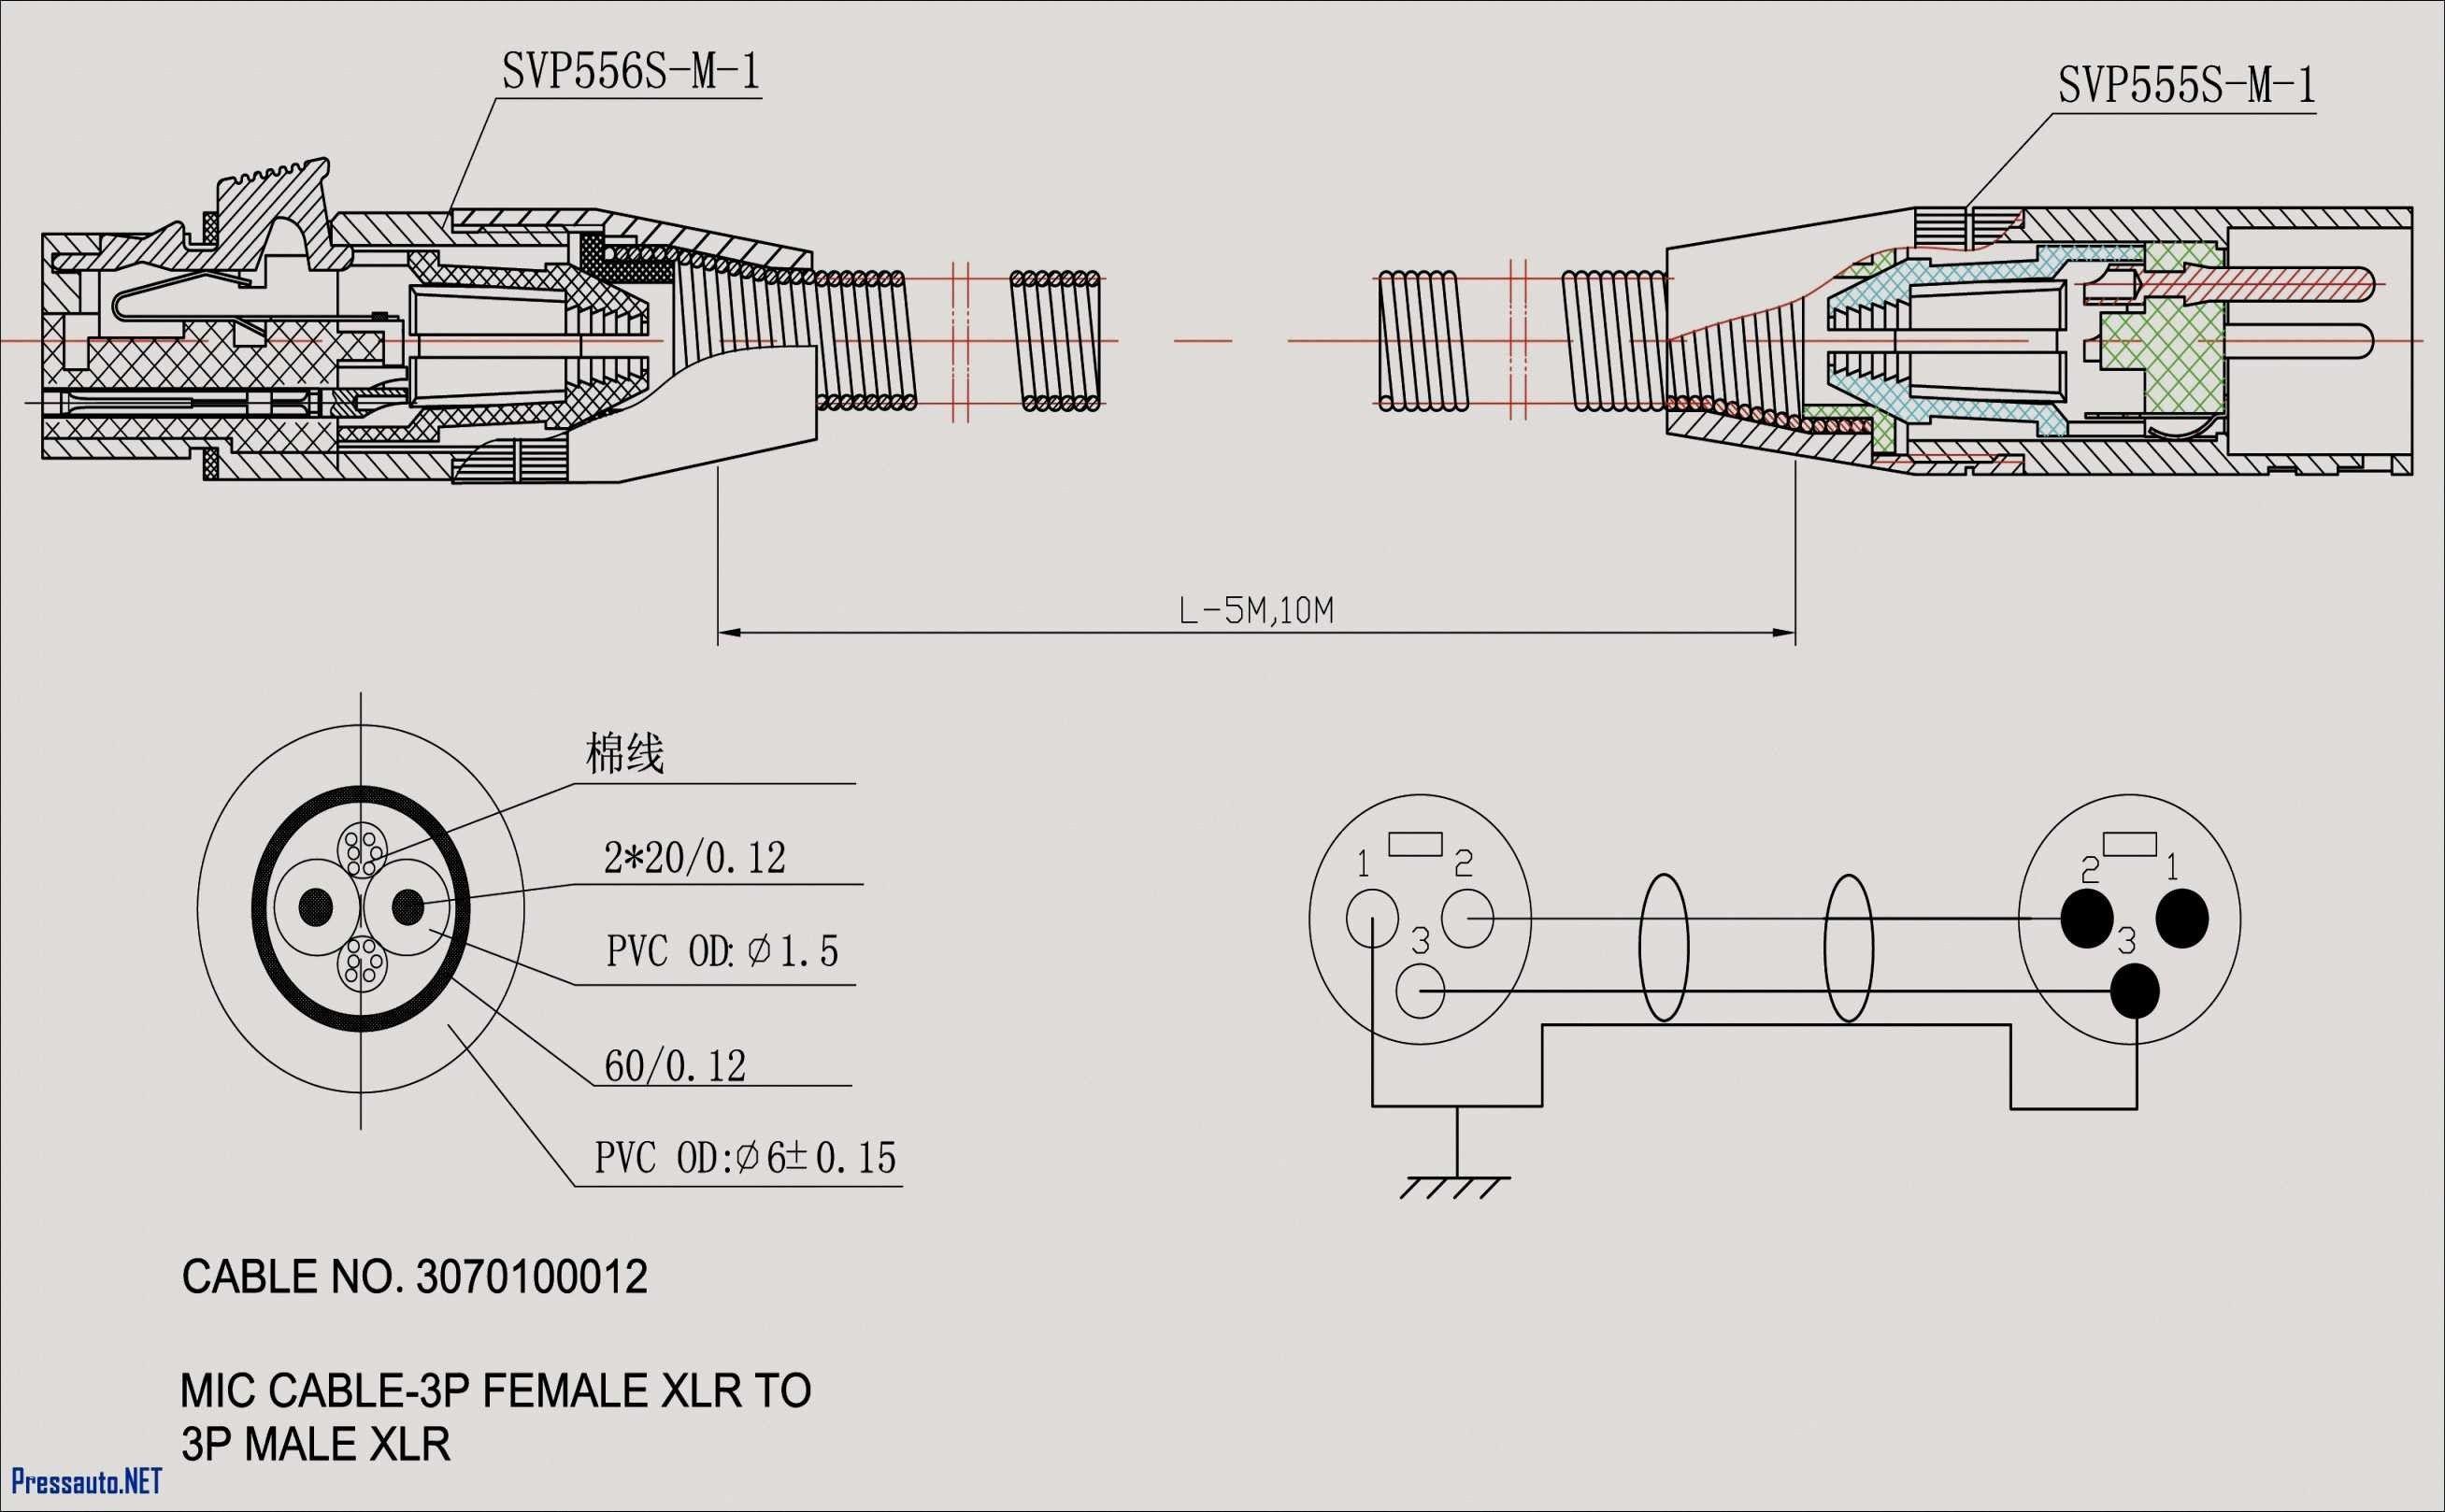 Inspirational Autodata Wiring Diagram Symbols diagrams ...